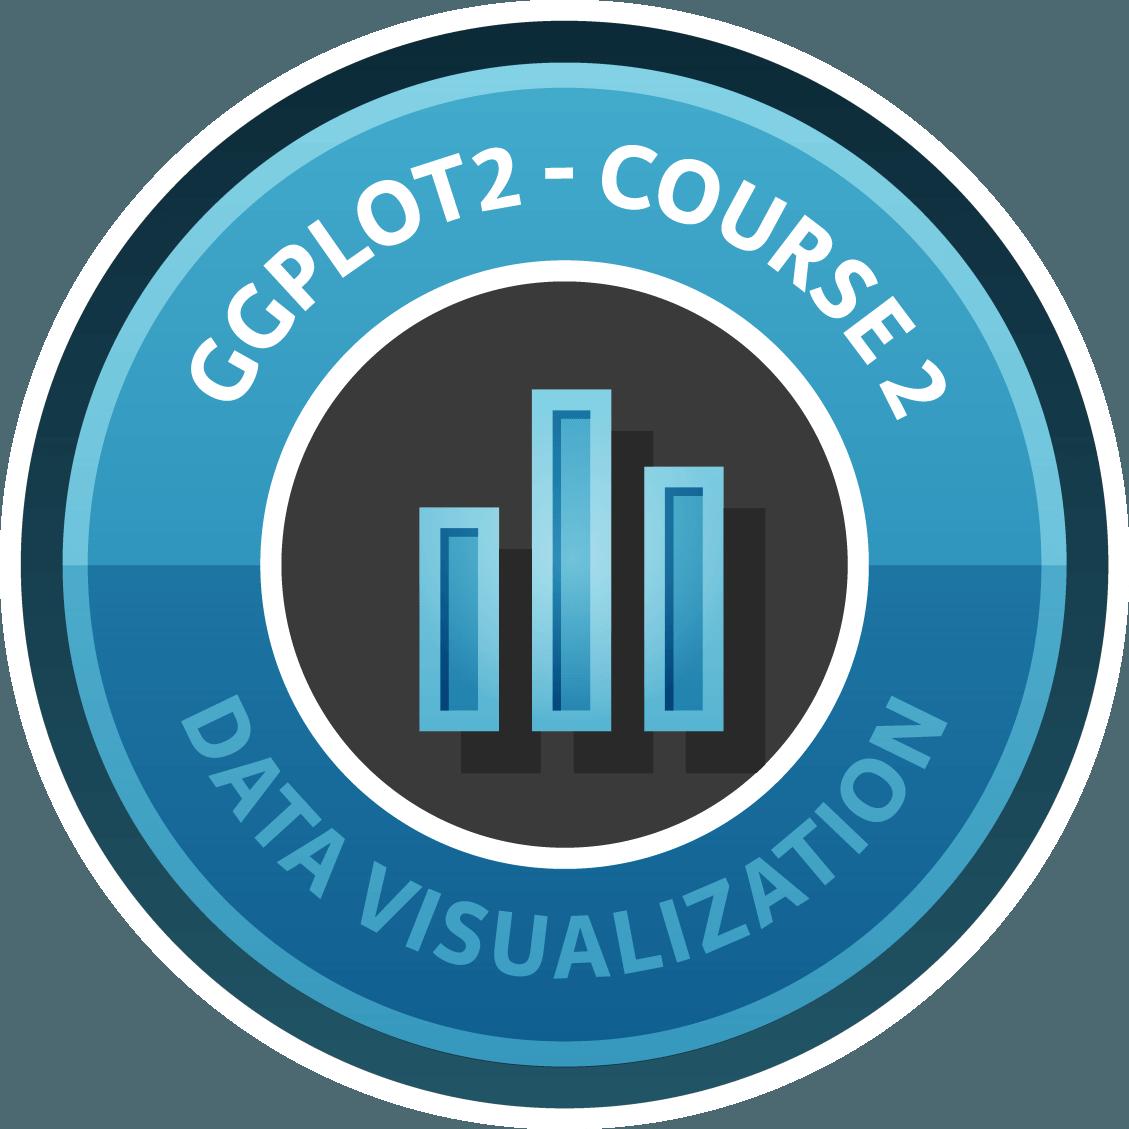 Data Visualization with ggplot2 (2)